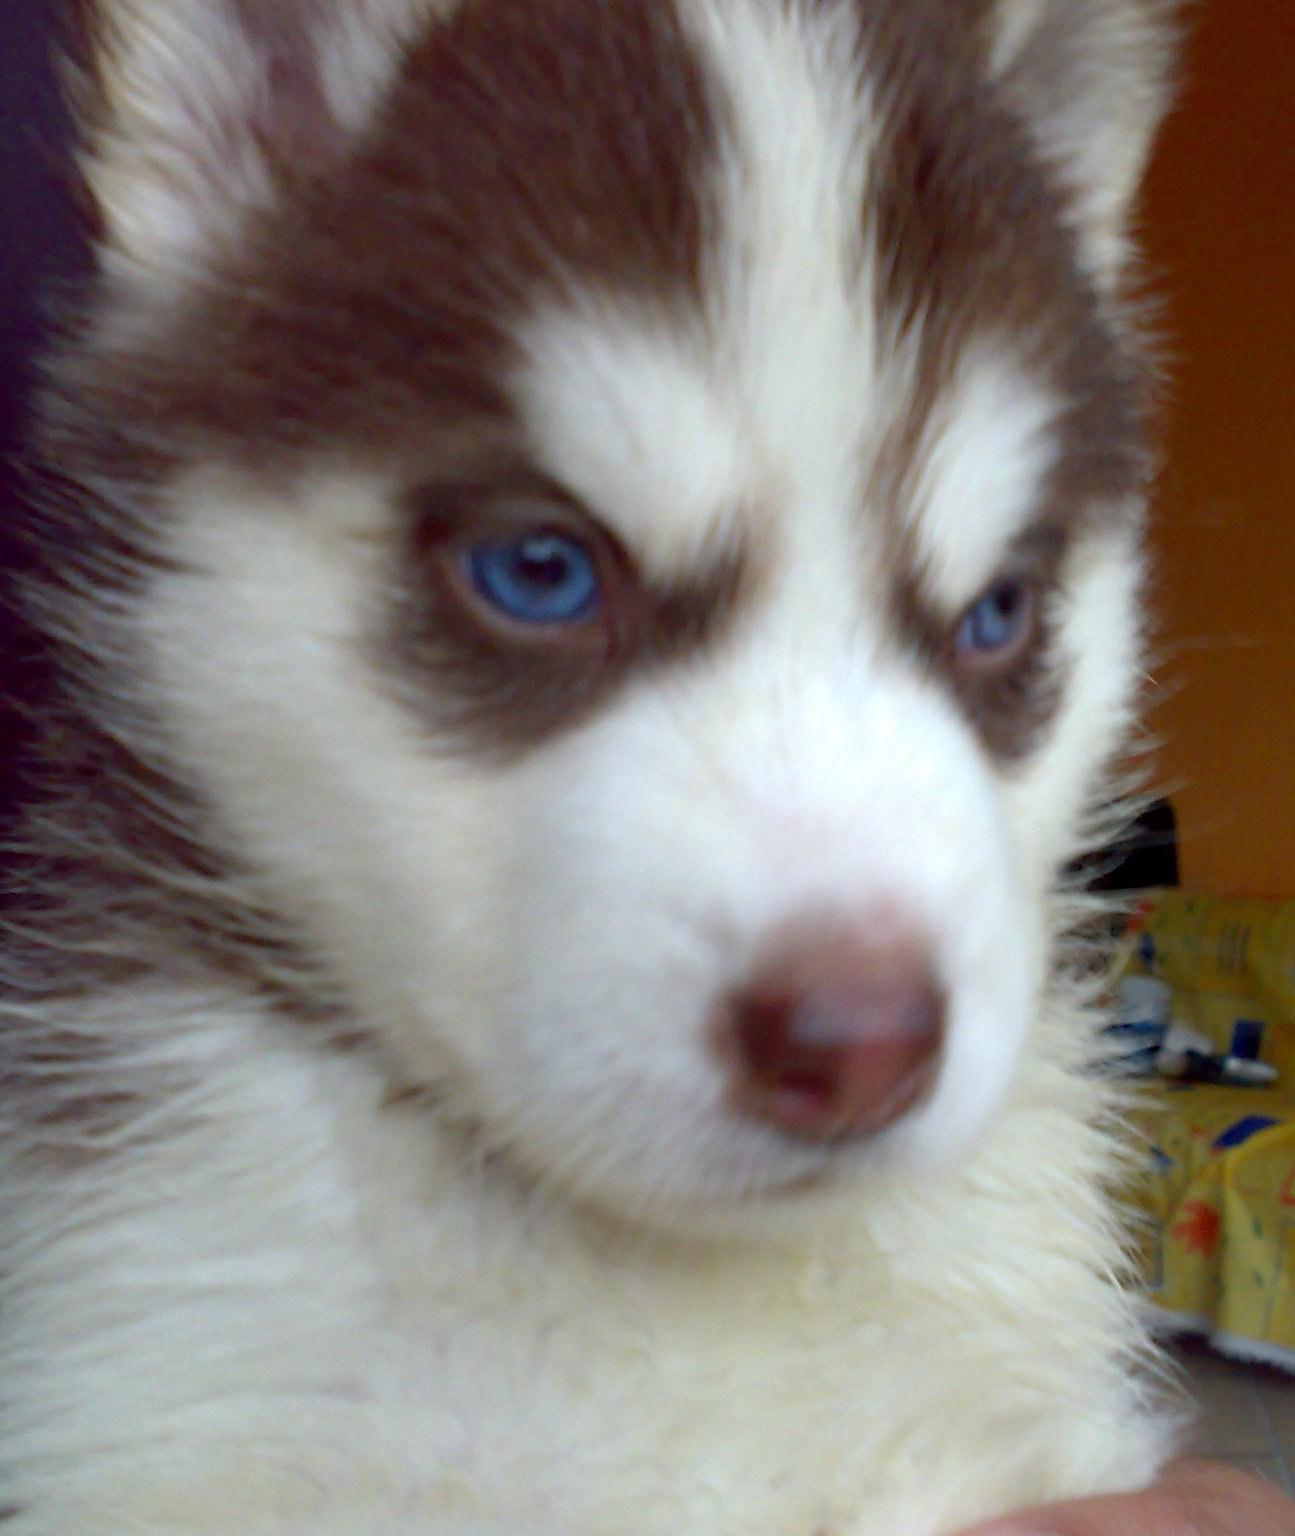 Fotos de perros husky siberiano - perros.about.com